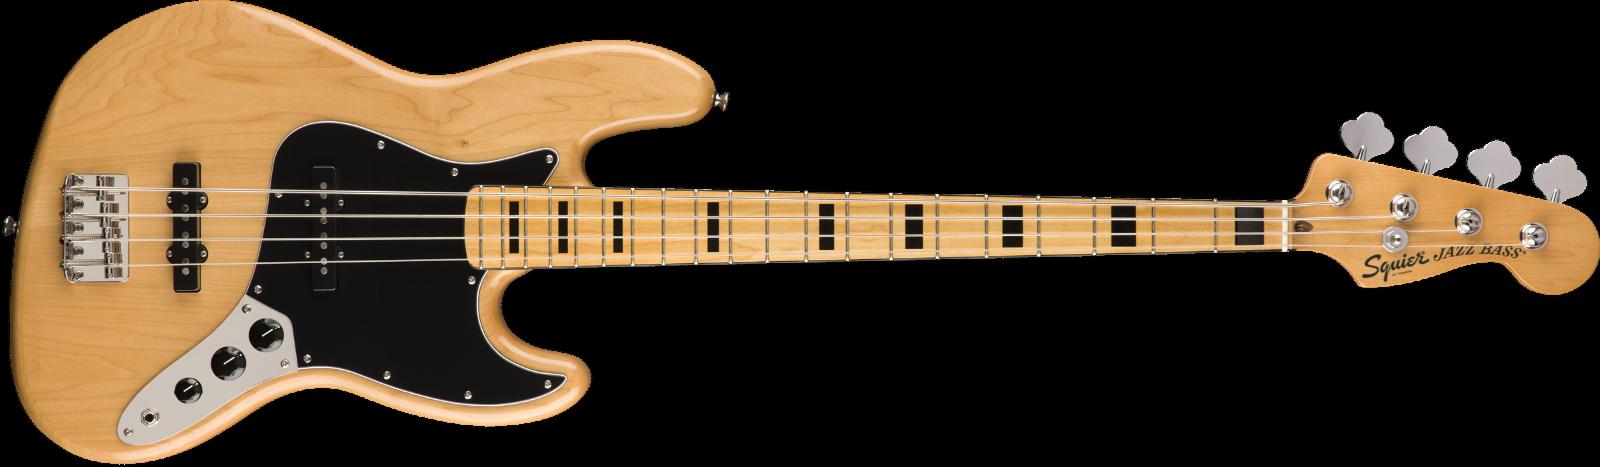 Squier Classic Vibe '70s Jazz Bass MN Natur